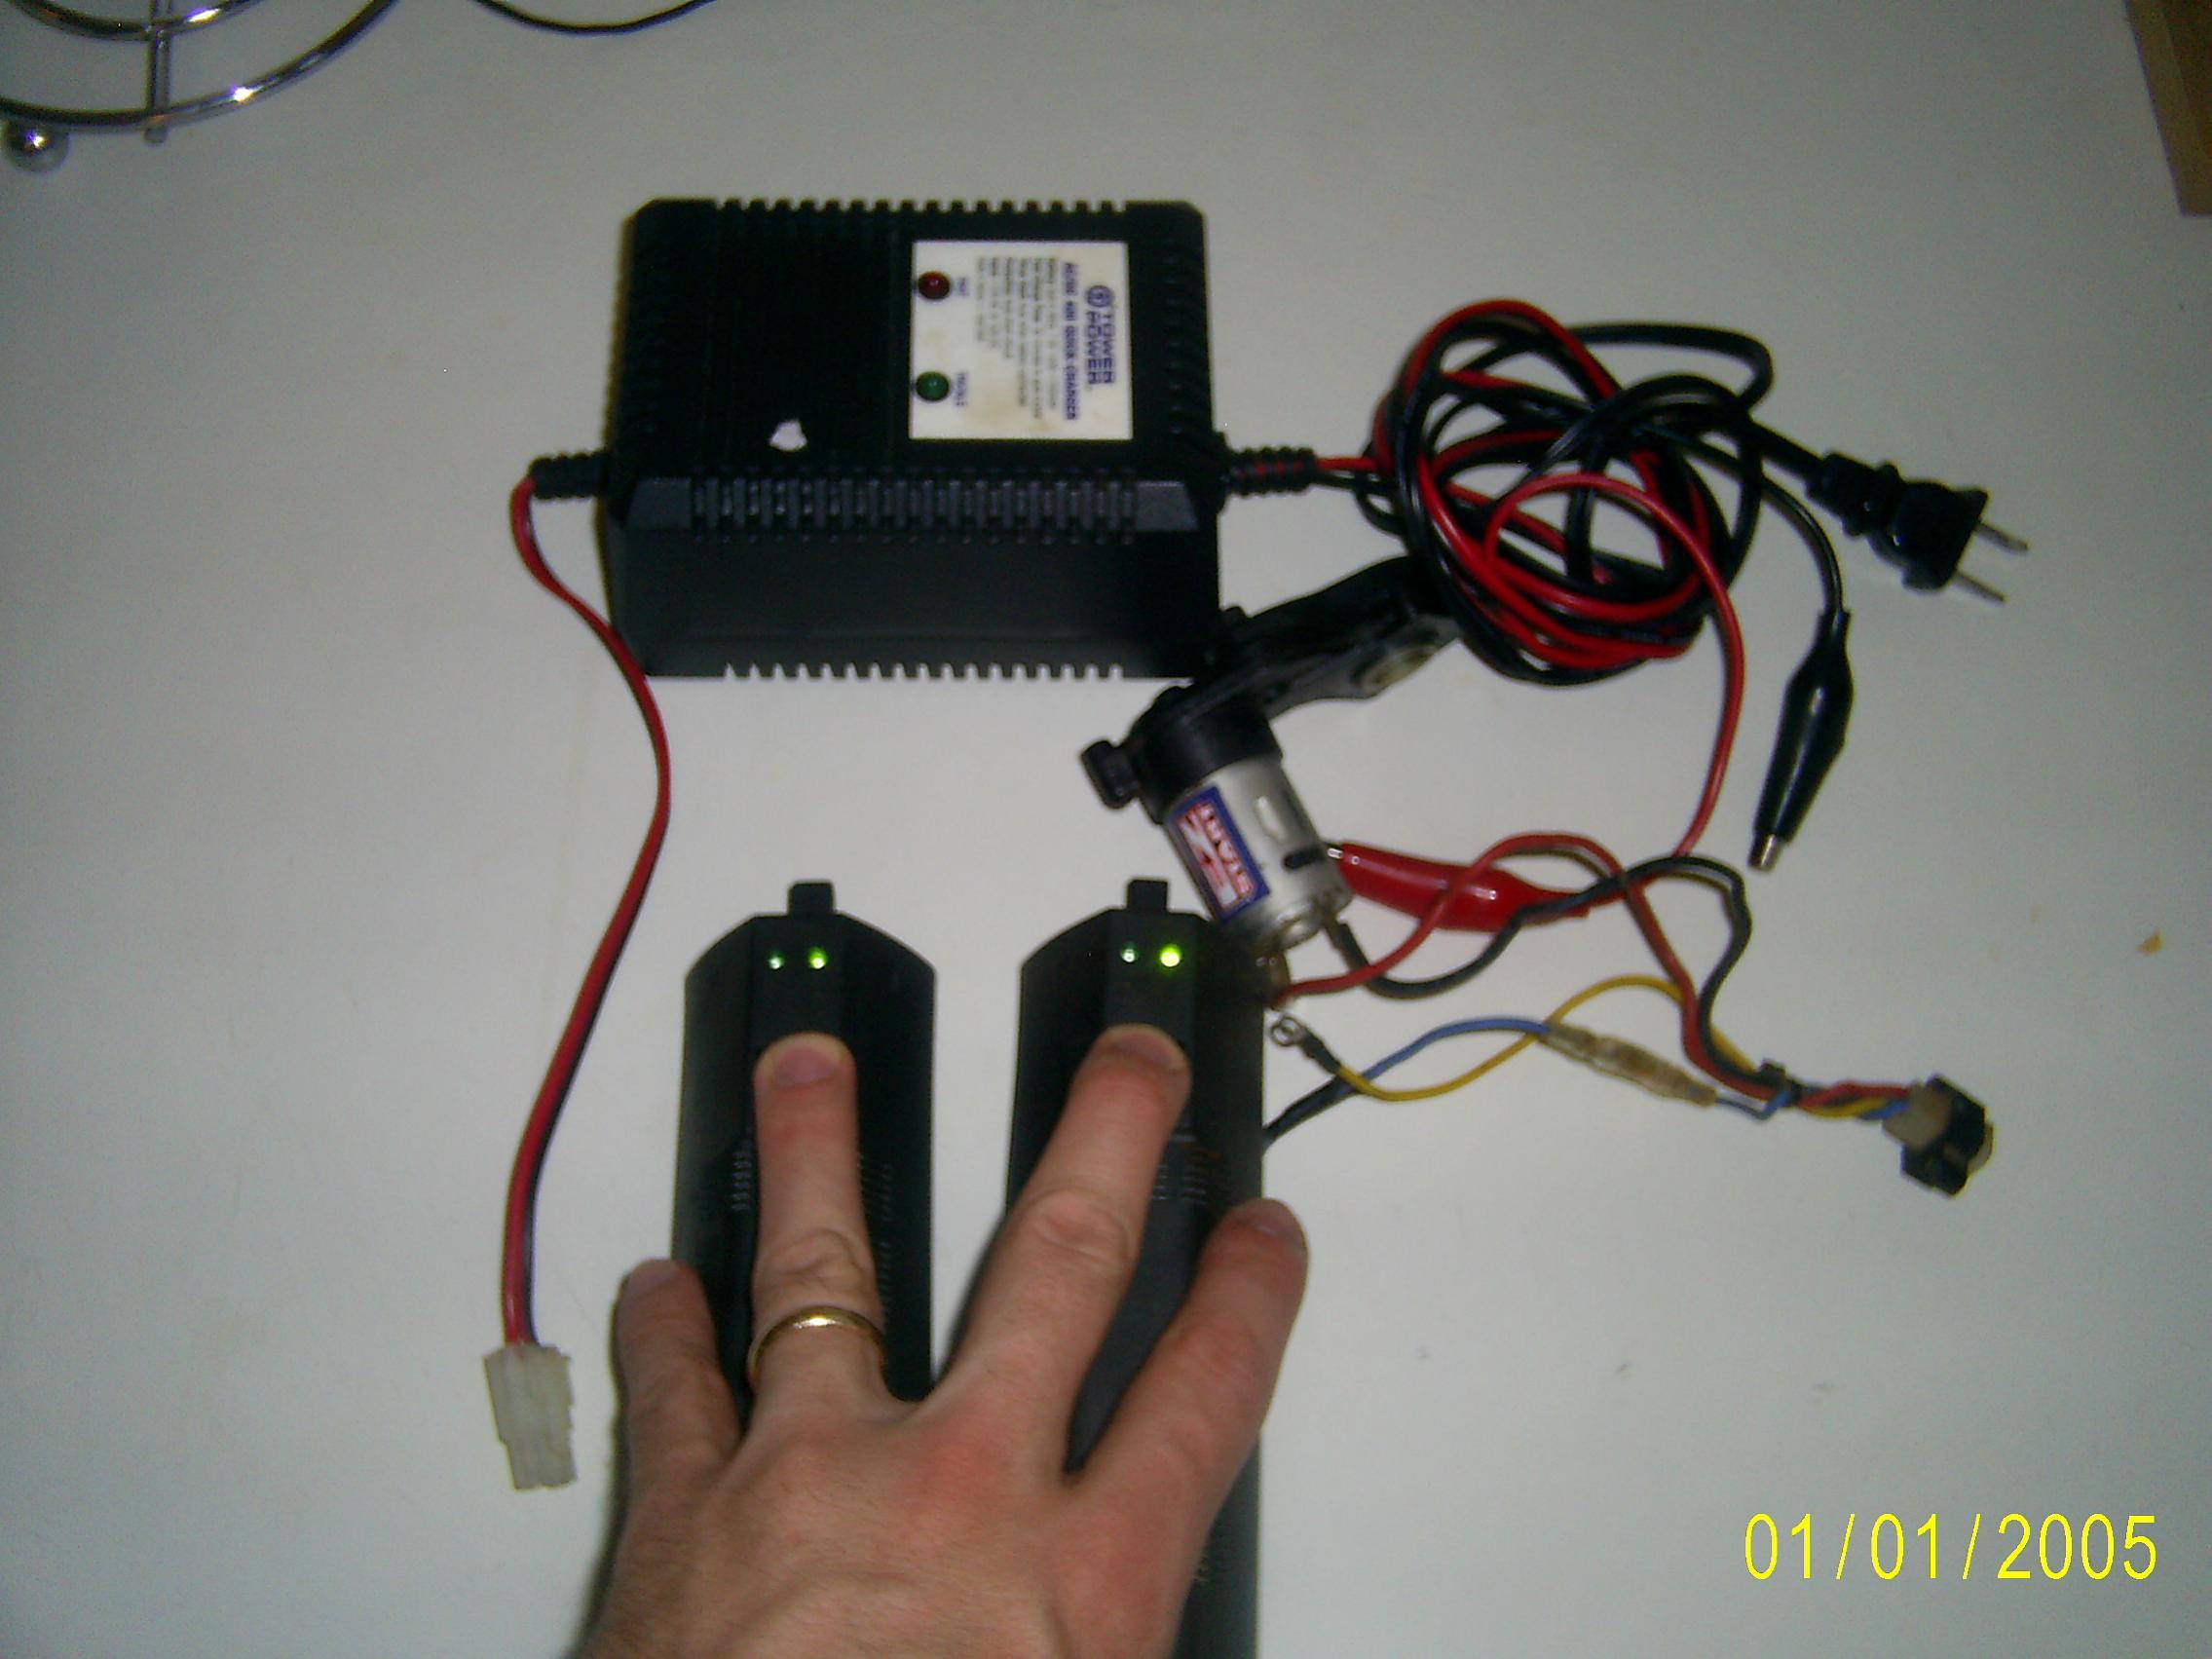 461953d1244334536 ez start2 full setup revo foc revo aluminum roll hoop s4020240 ez start 2 complete setup, revo foc traxxas ez start wiring harness at panicattacktreatment.co